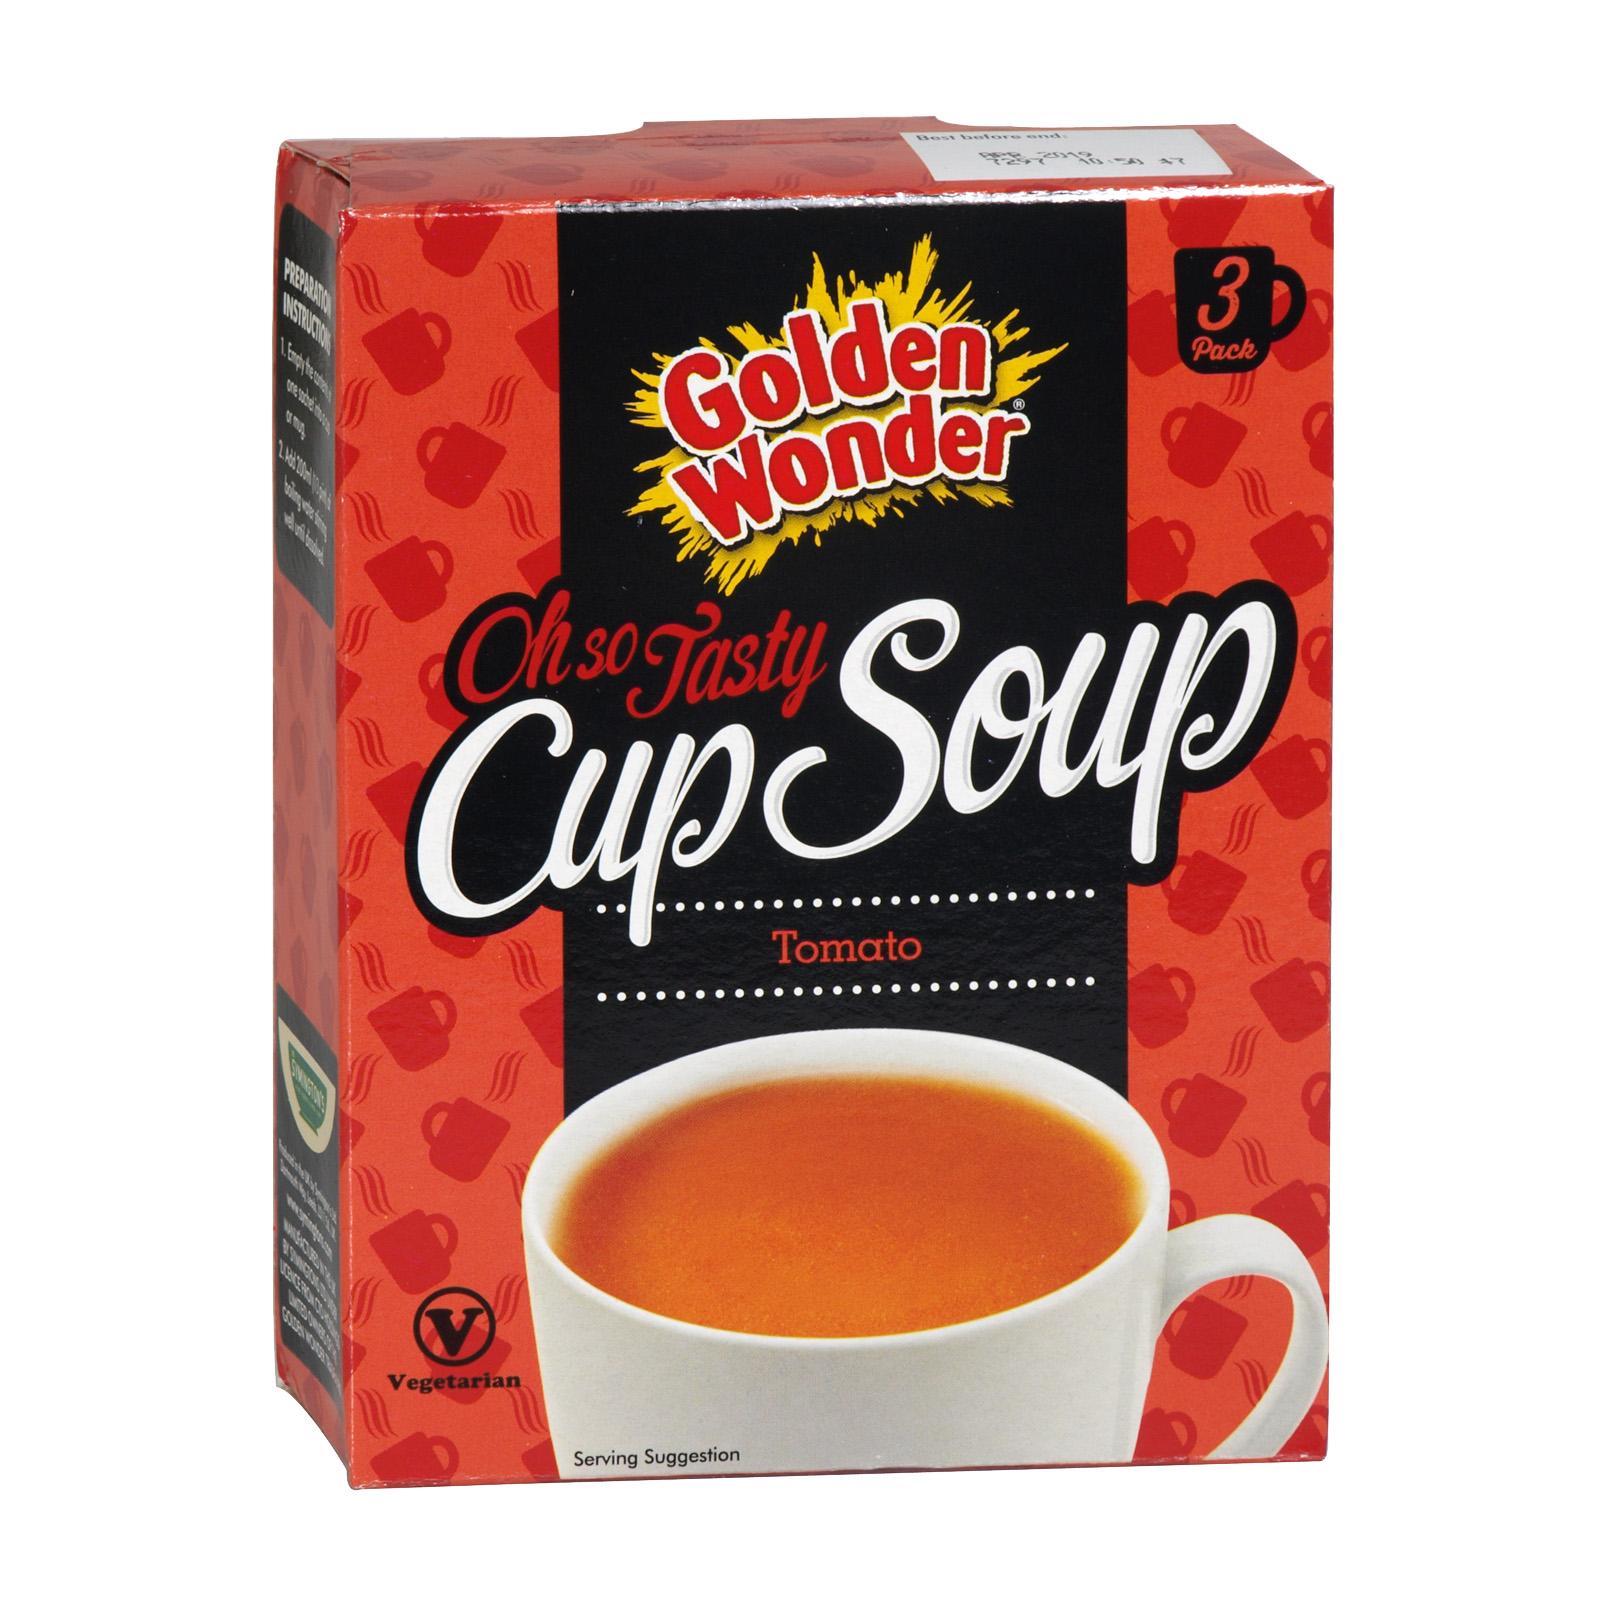 GOLDEN WONDER CUP SOUP TOMATO 3PK